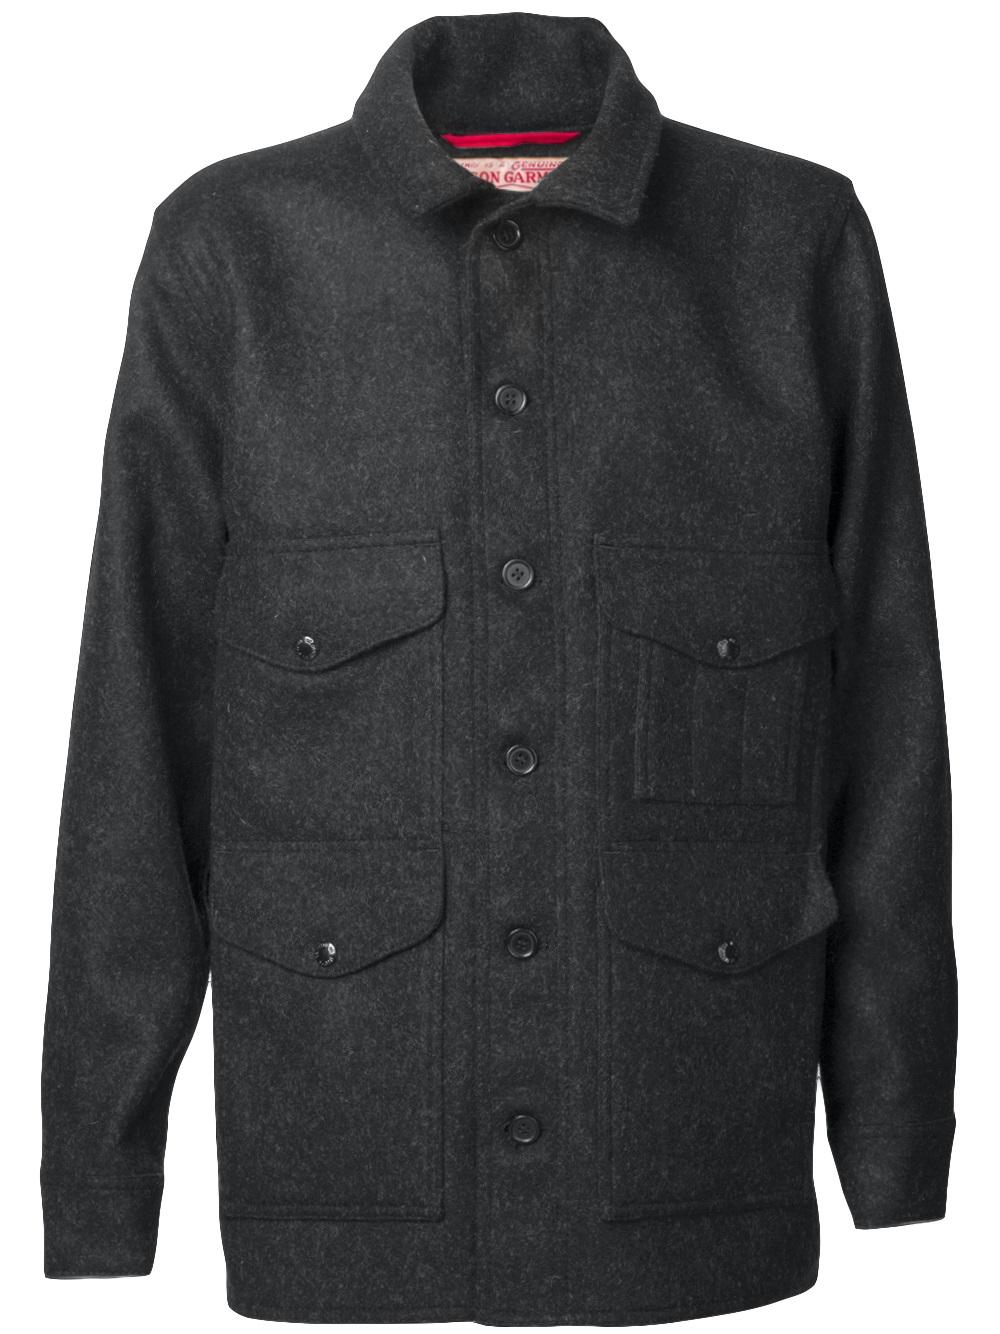 Filson Mackinaw Jacket In Gray For Men Lyst